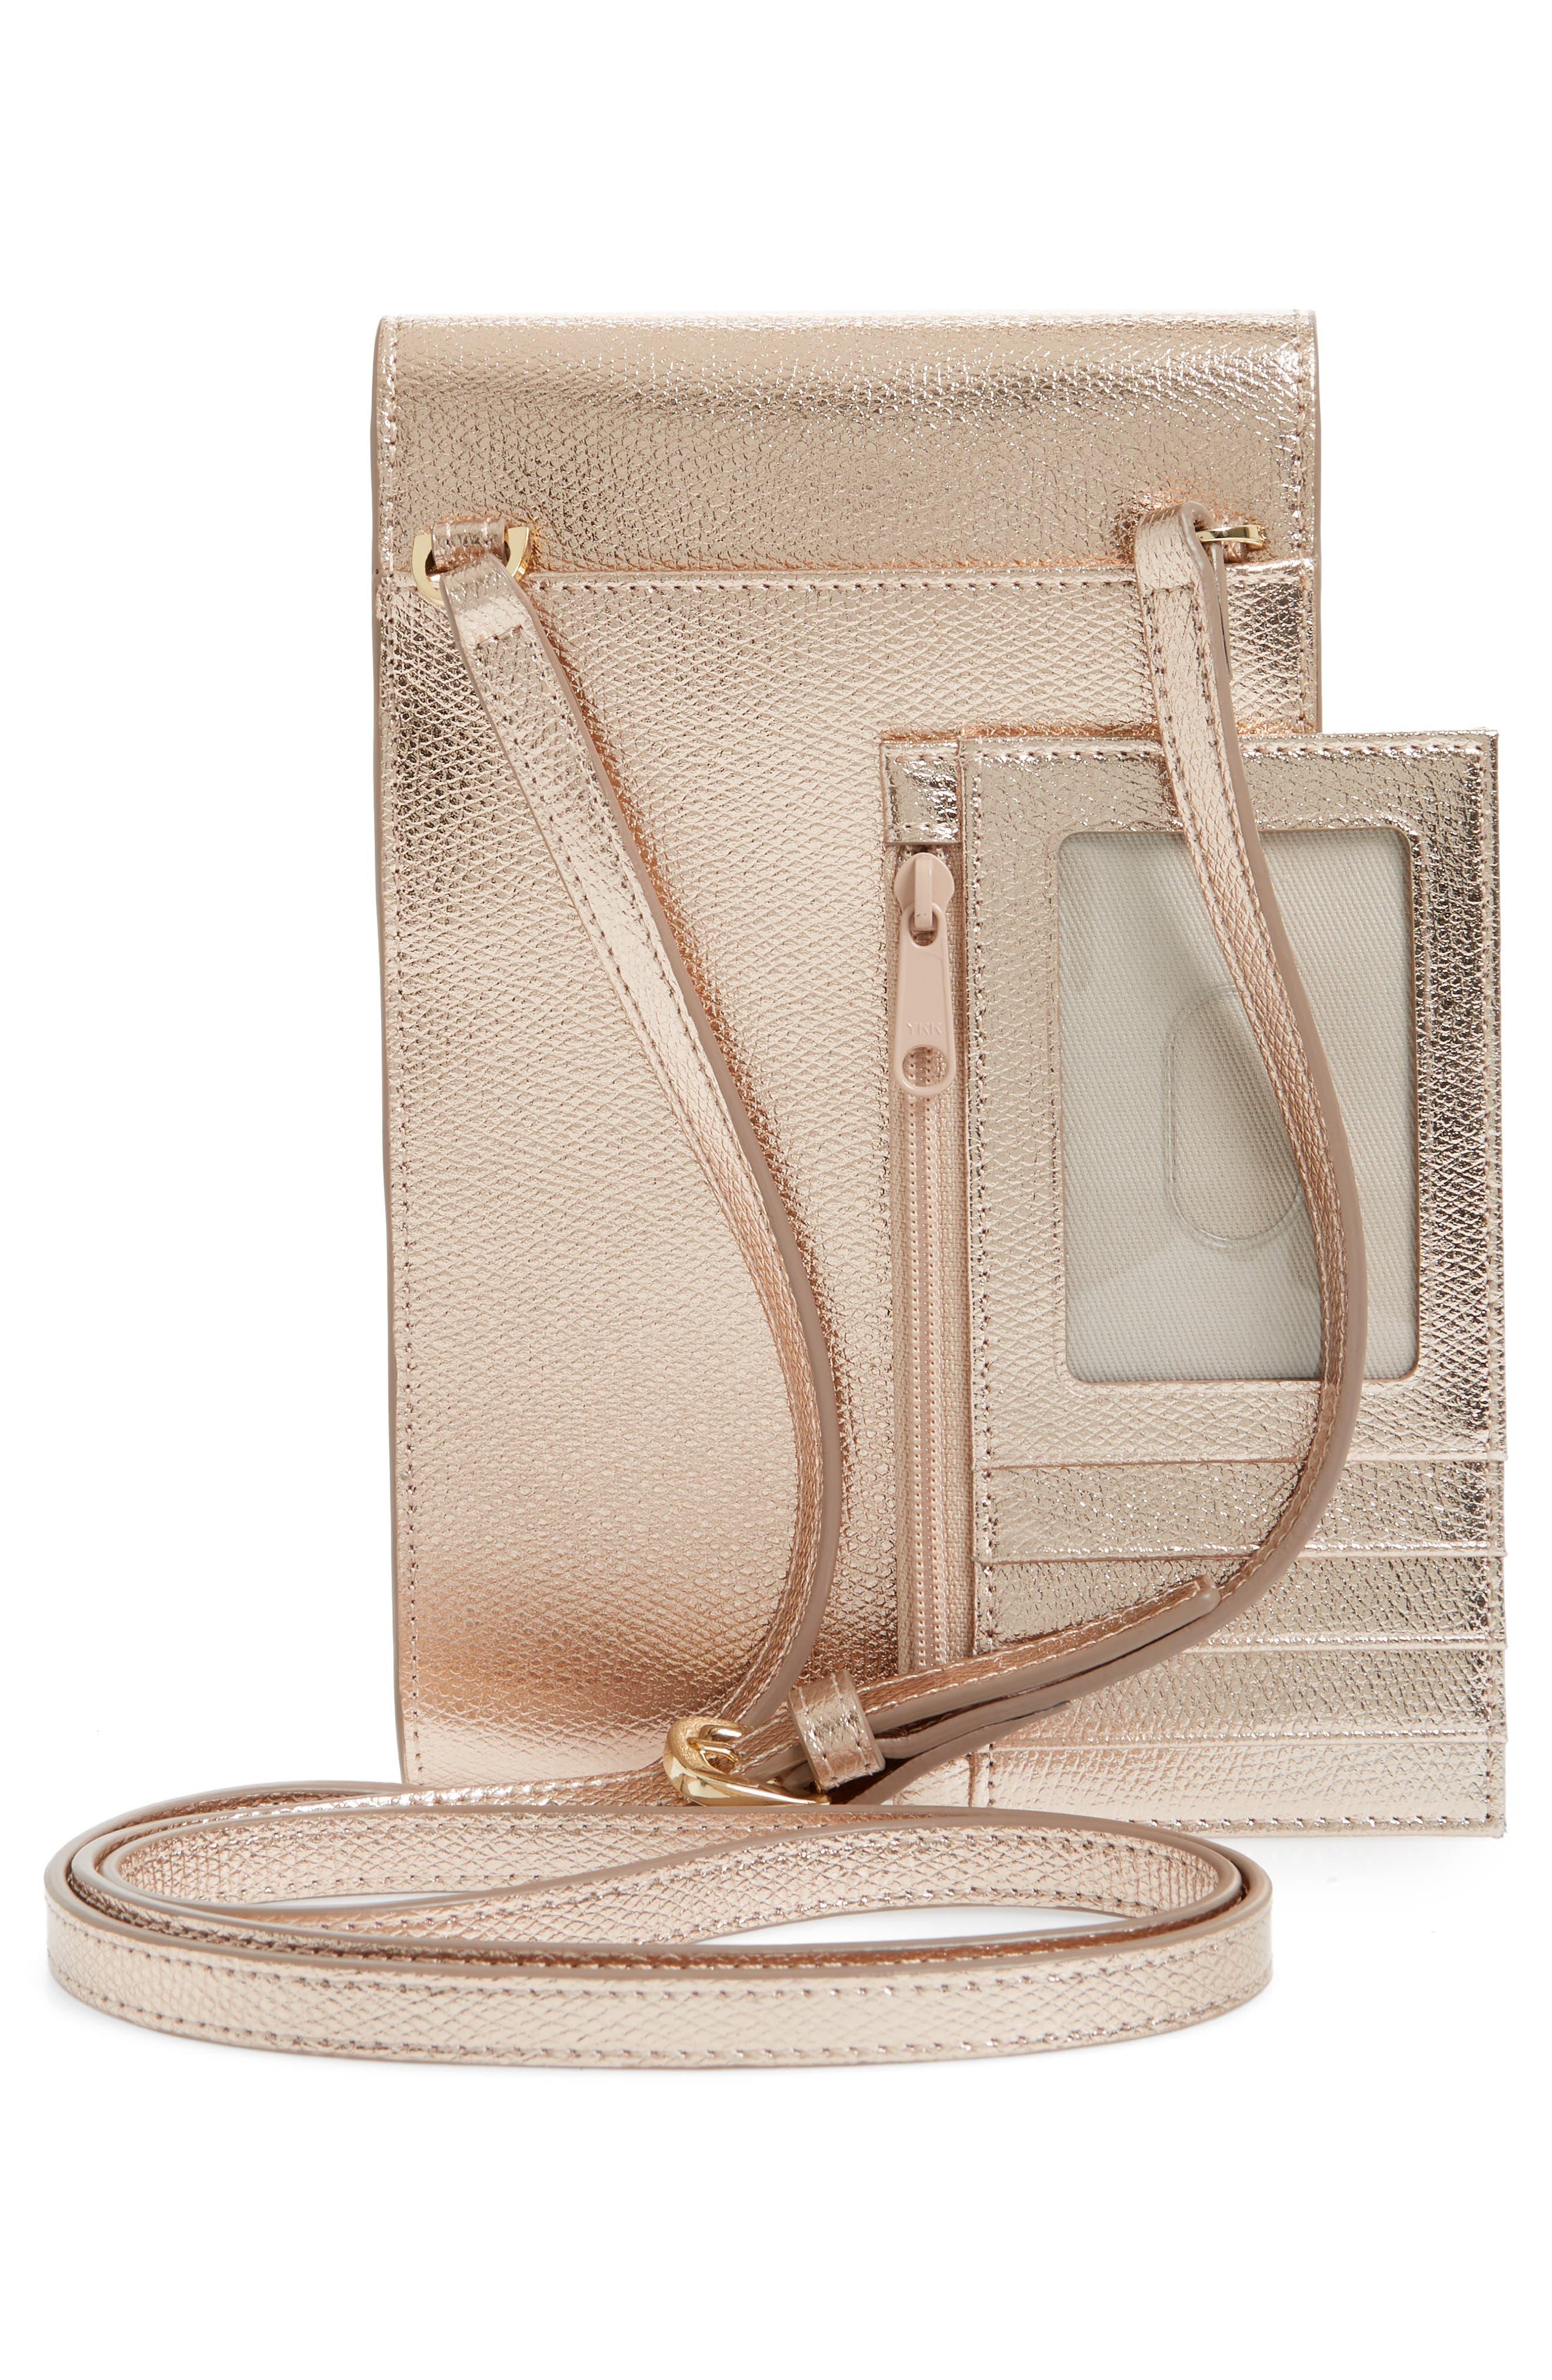 Metallic Leather Phone Crossbody Bag,                             Alternate thumbnail 3, color,                             220